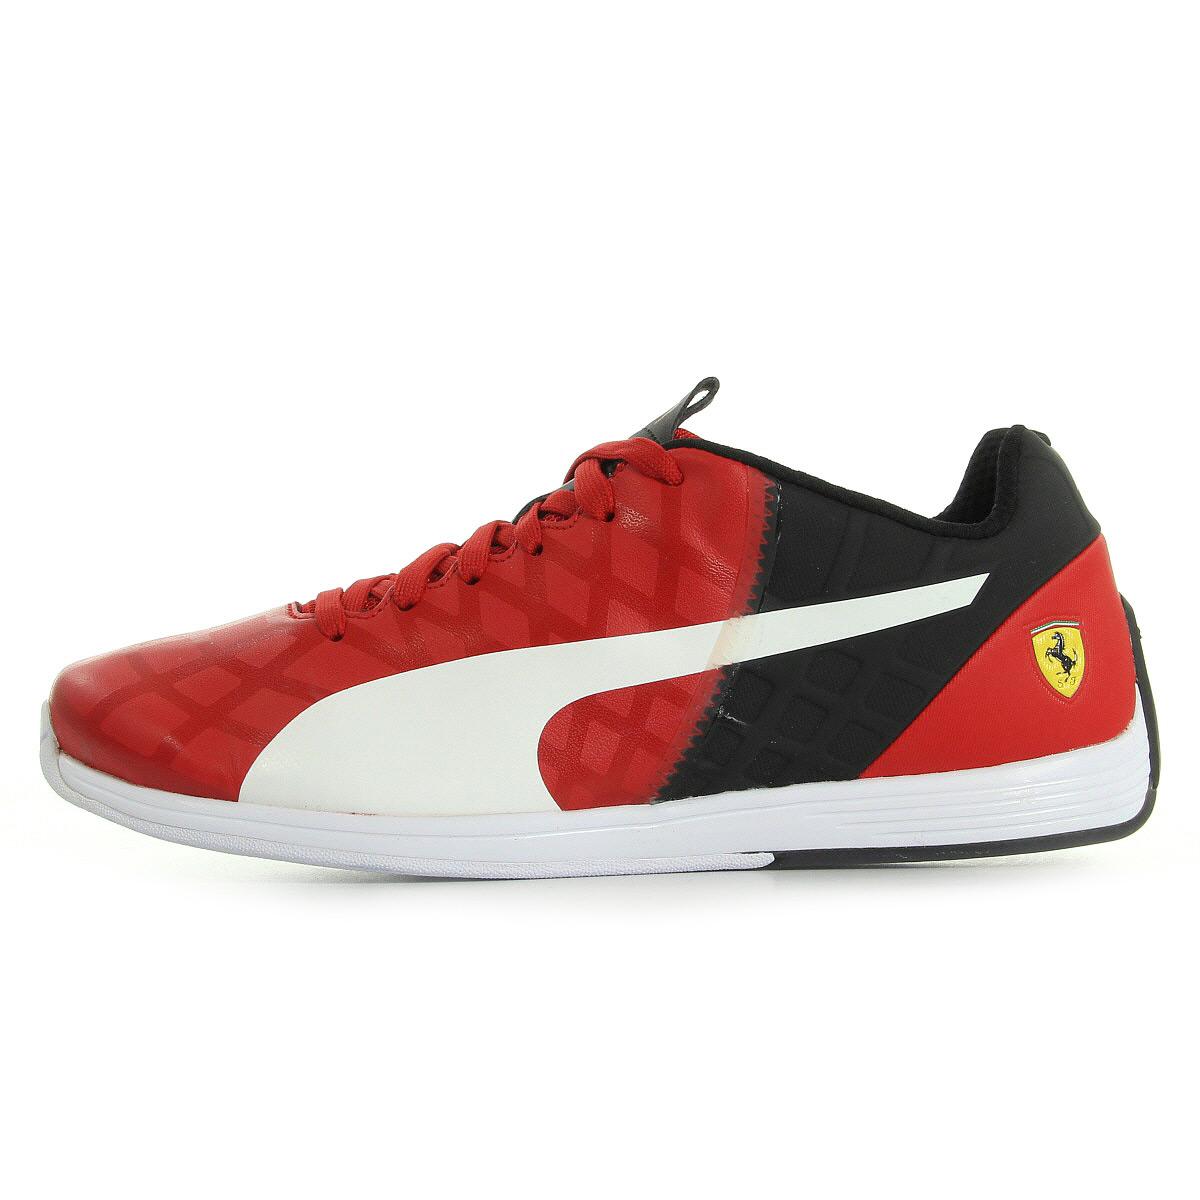 puma evospeed 1 4 sf 30555502 chaussures handball homme. Black Bedroom Furniture Sets. Home Design Ideas